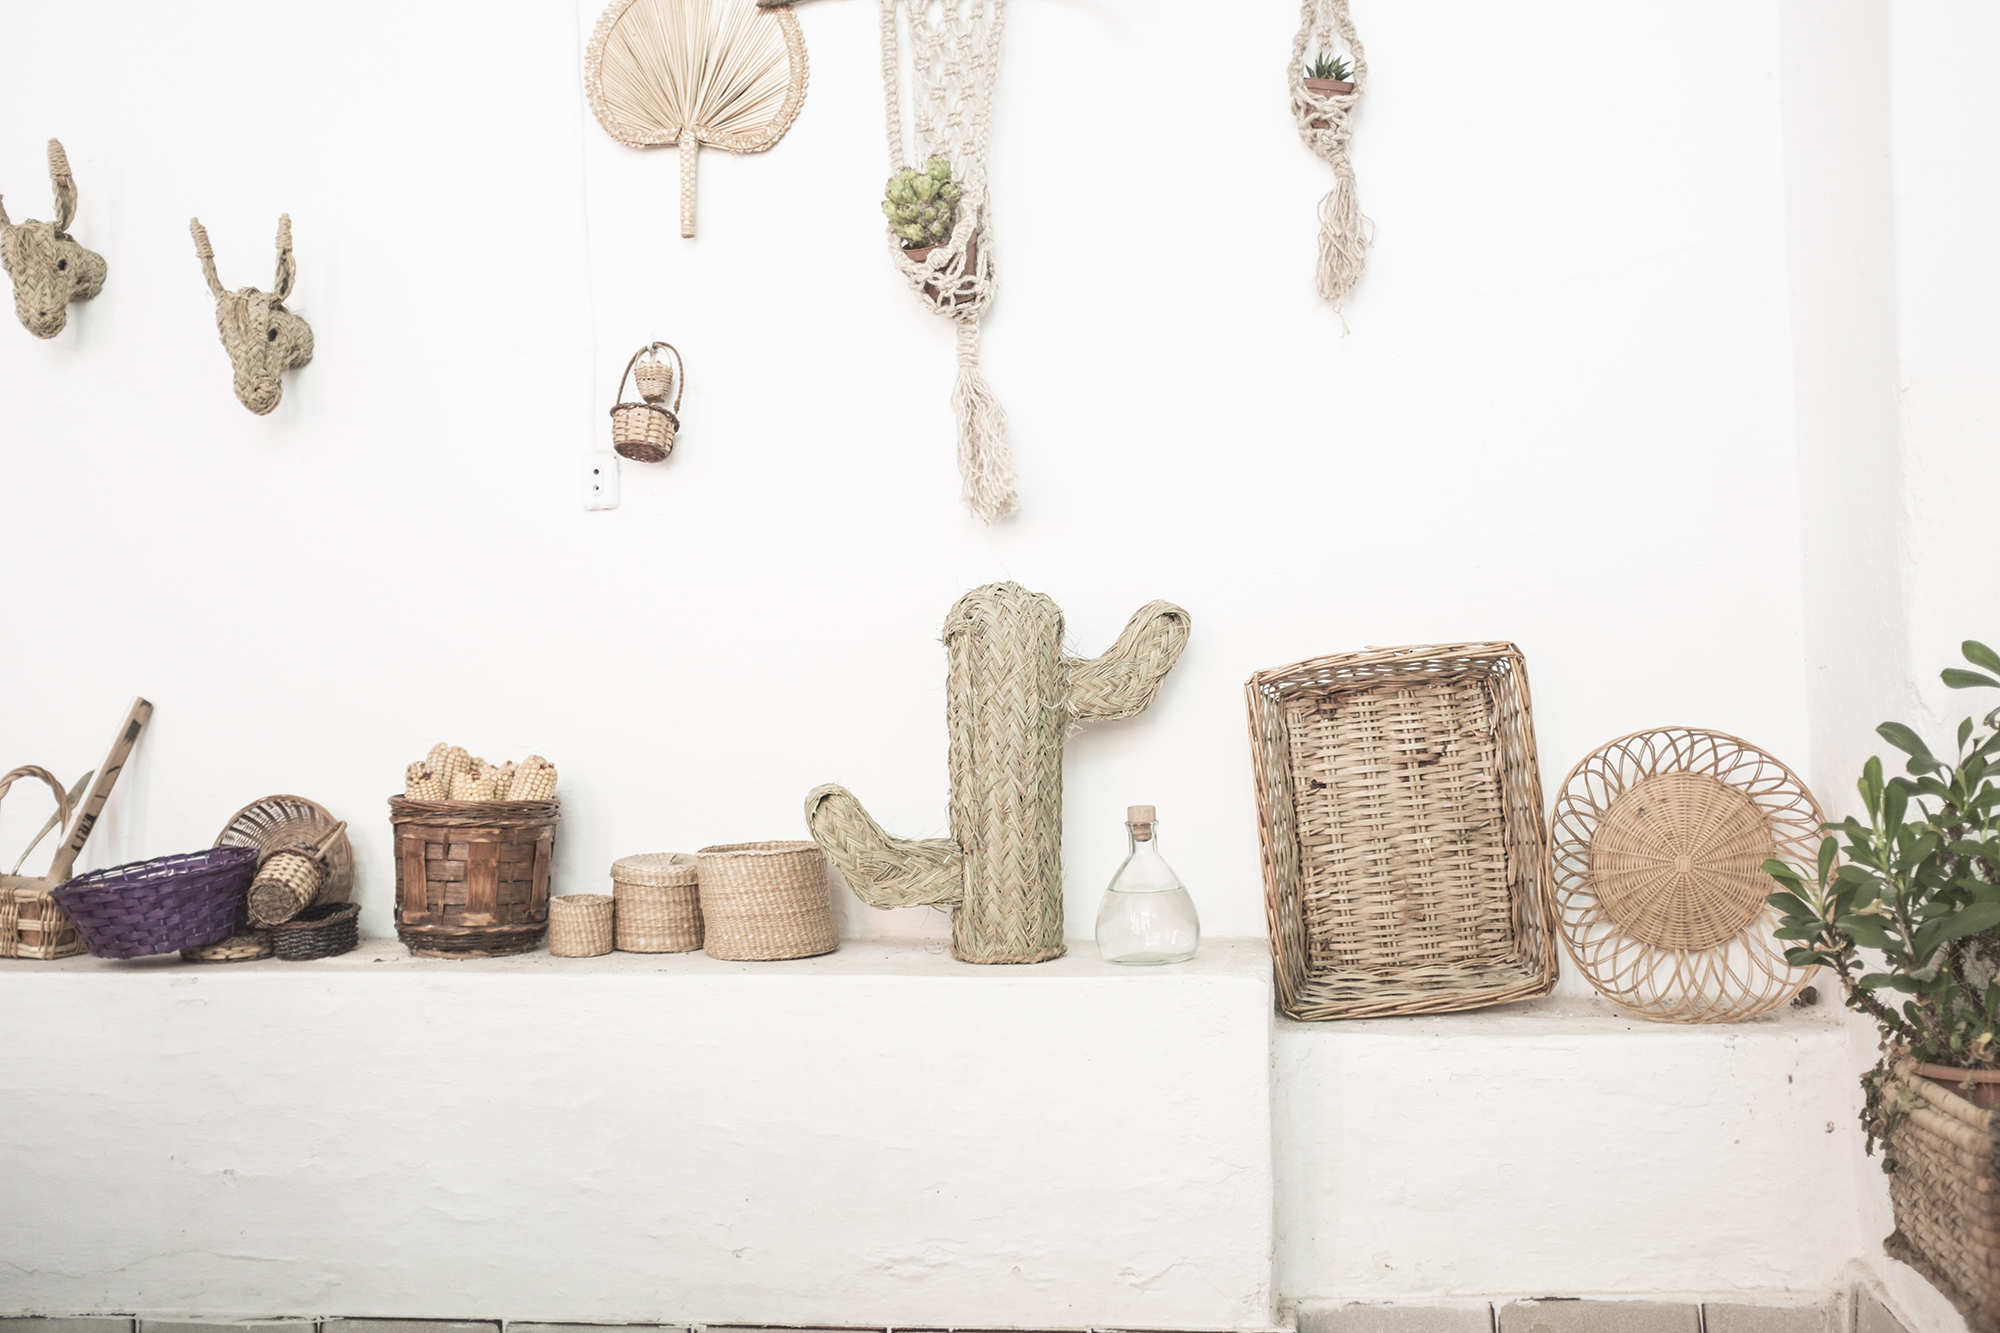 cactus natural mimbre palma hecho a mano artesania española